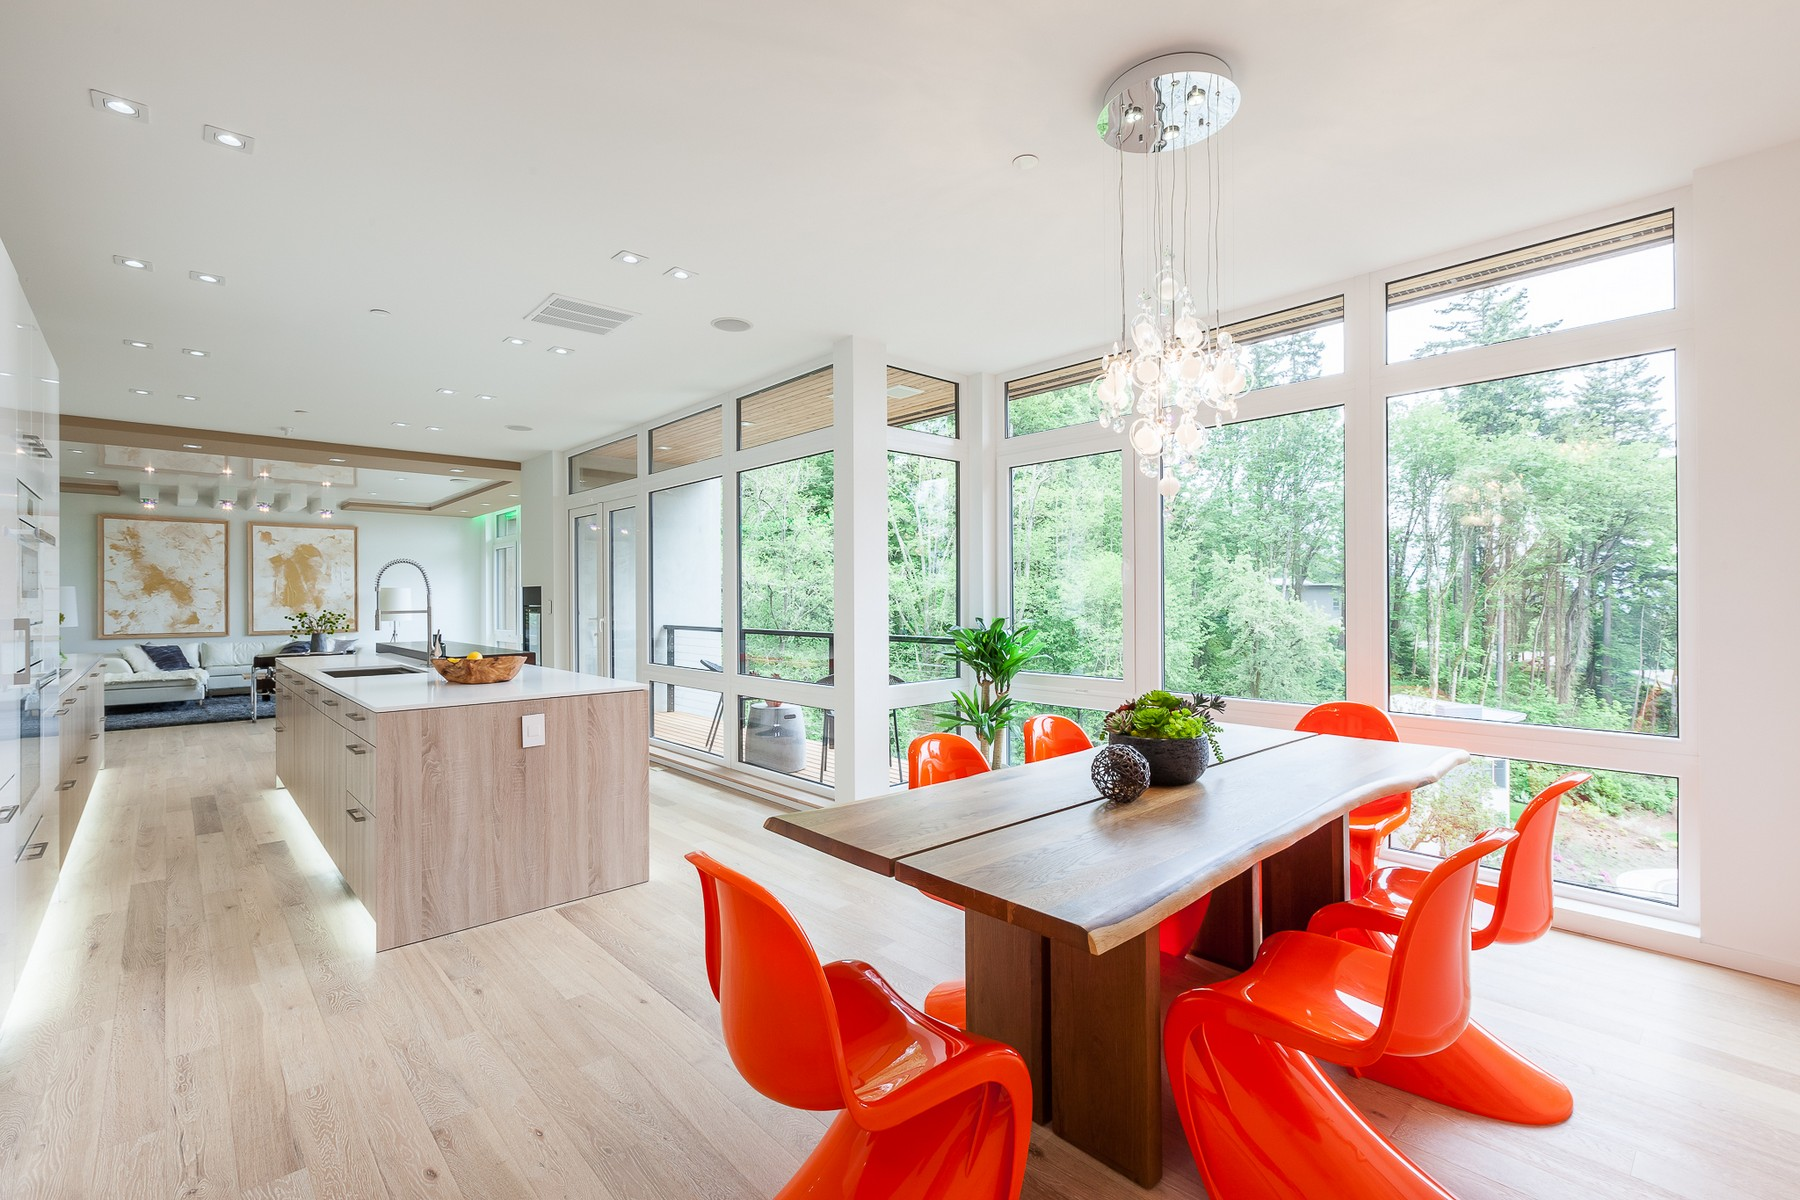 Single Family Home for Sale at Visually Distinct Modern 6520 NE 129th St Kirkland, Washington, 98034 United States